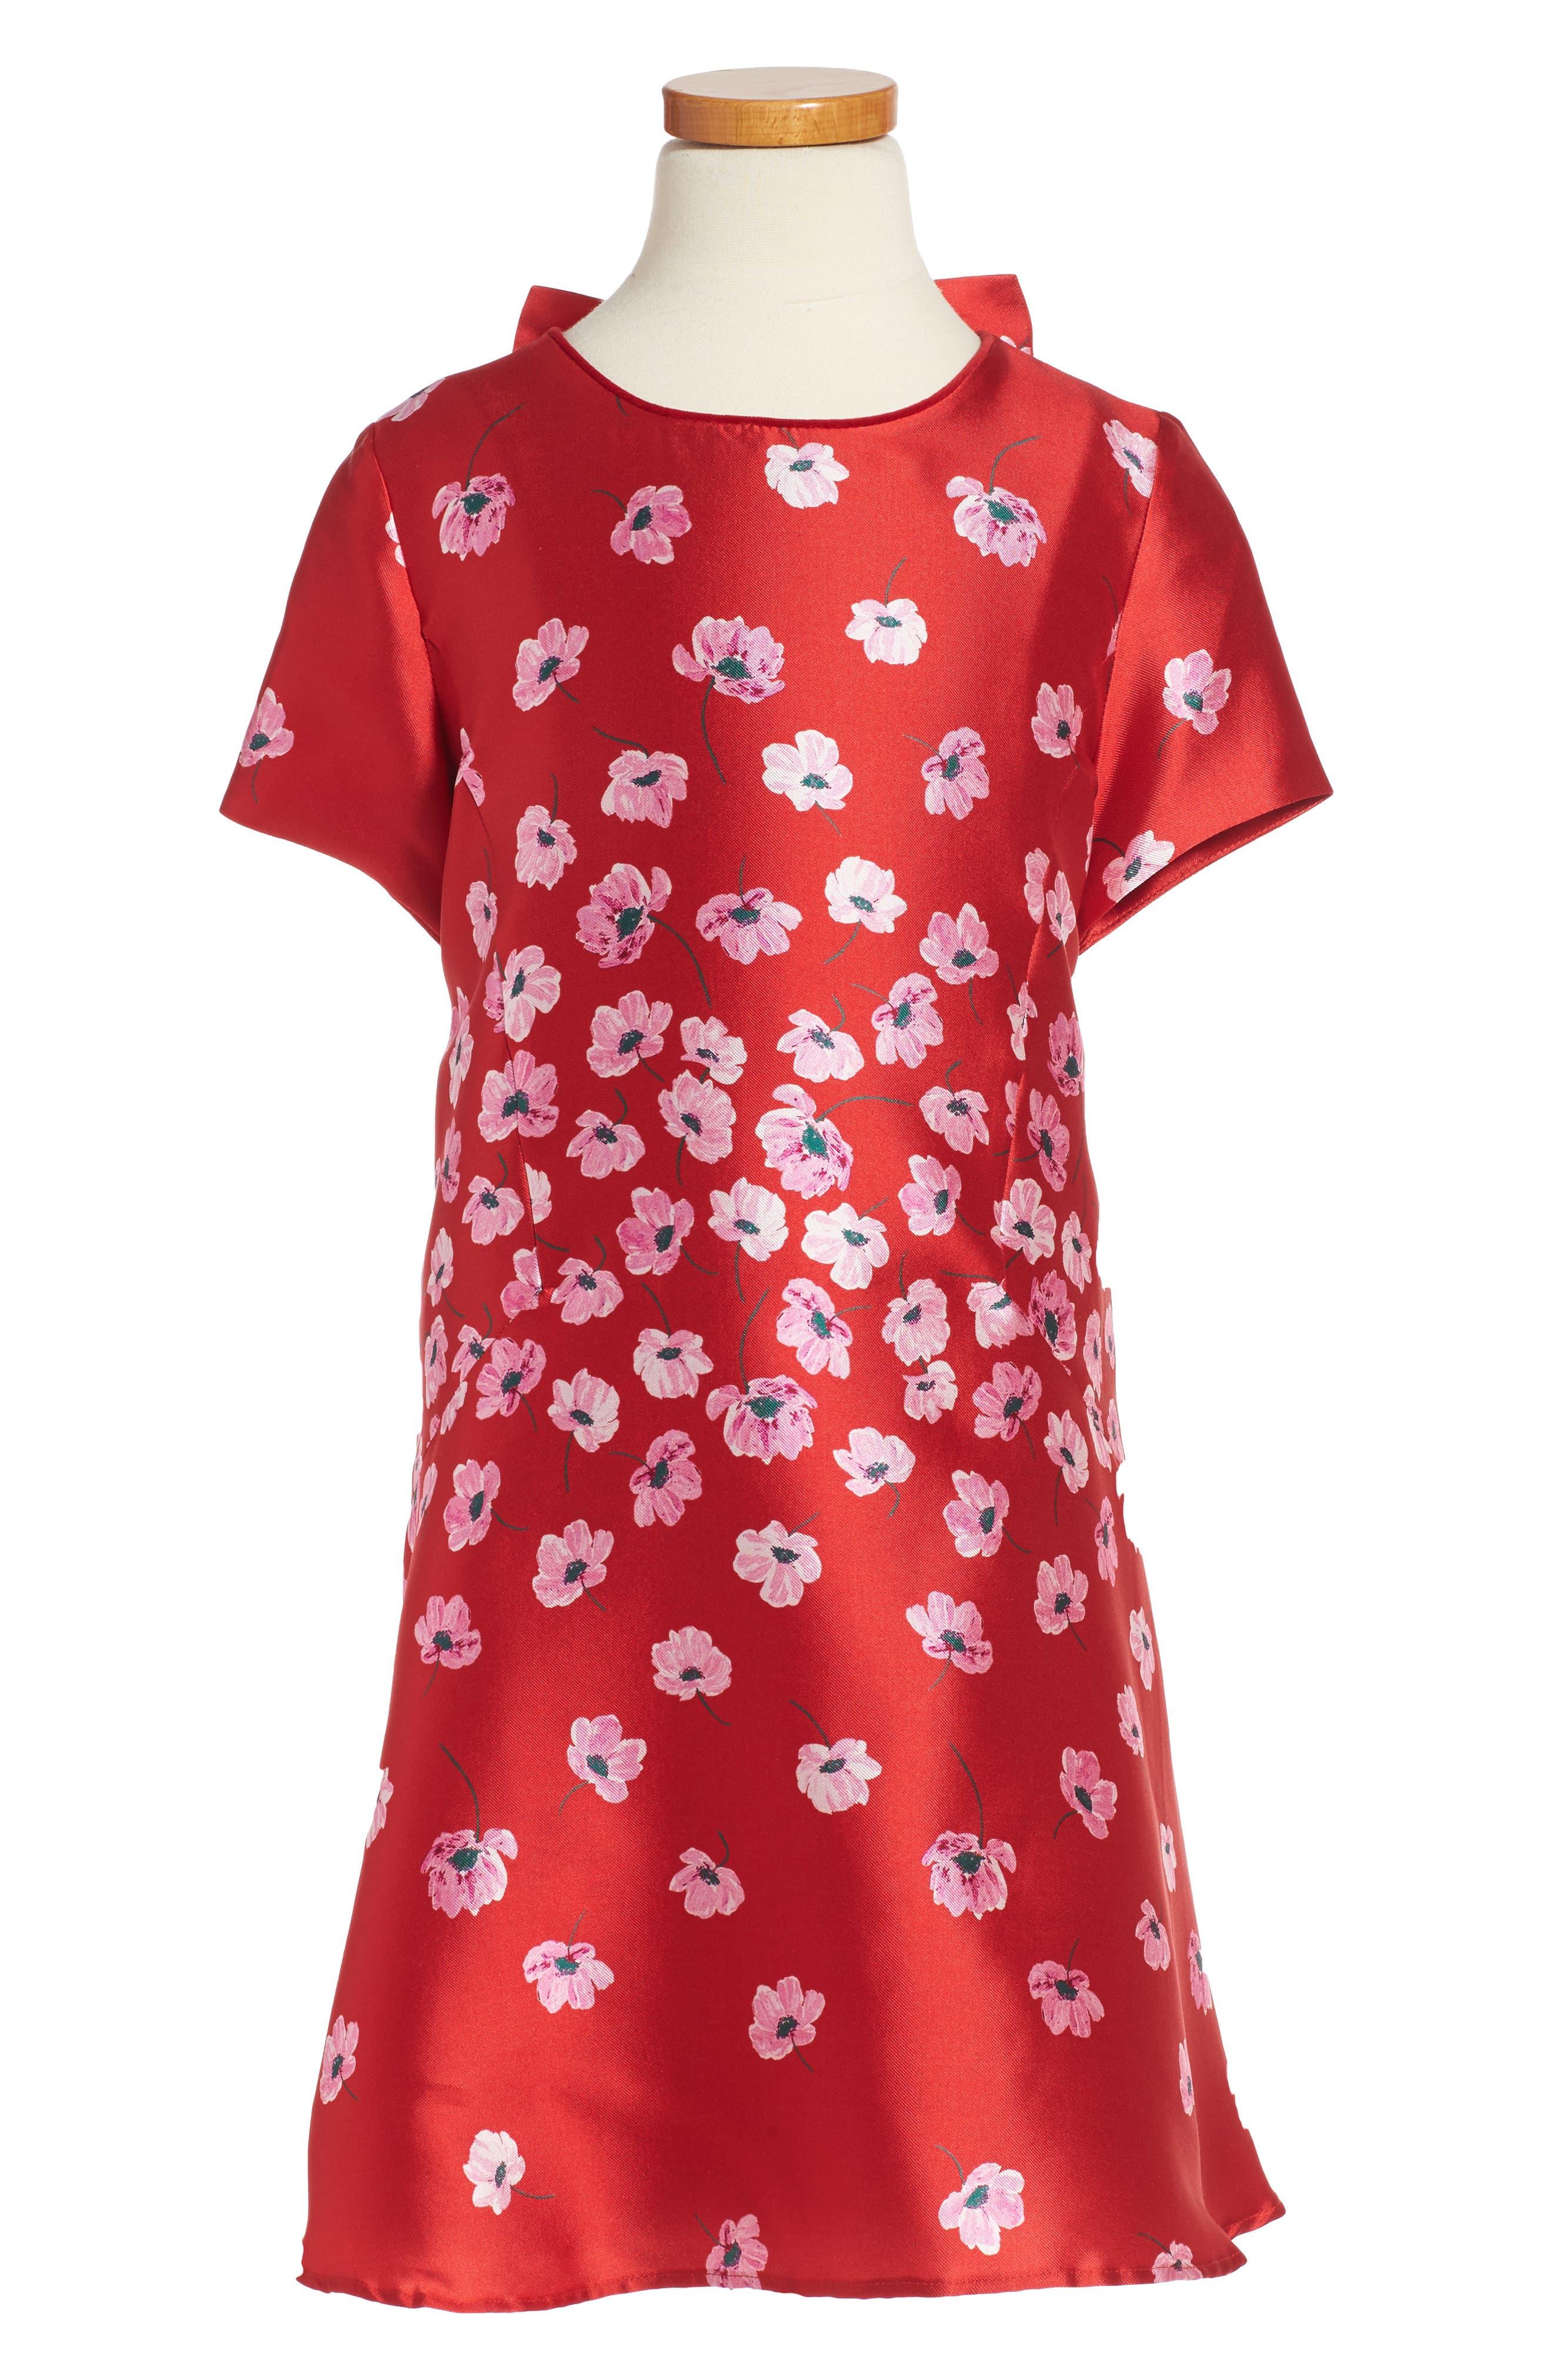 Alternate Image 1 Selected - Oscar de la Renta Poppies Mikado Dress (Big Girls)